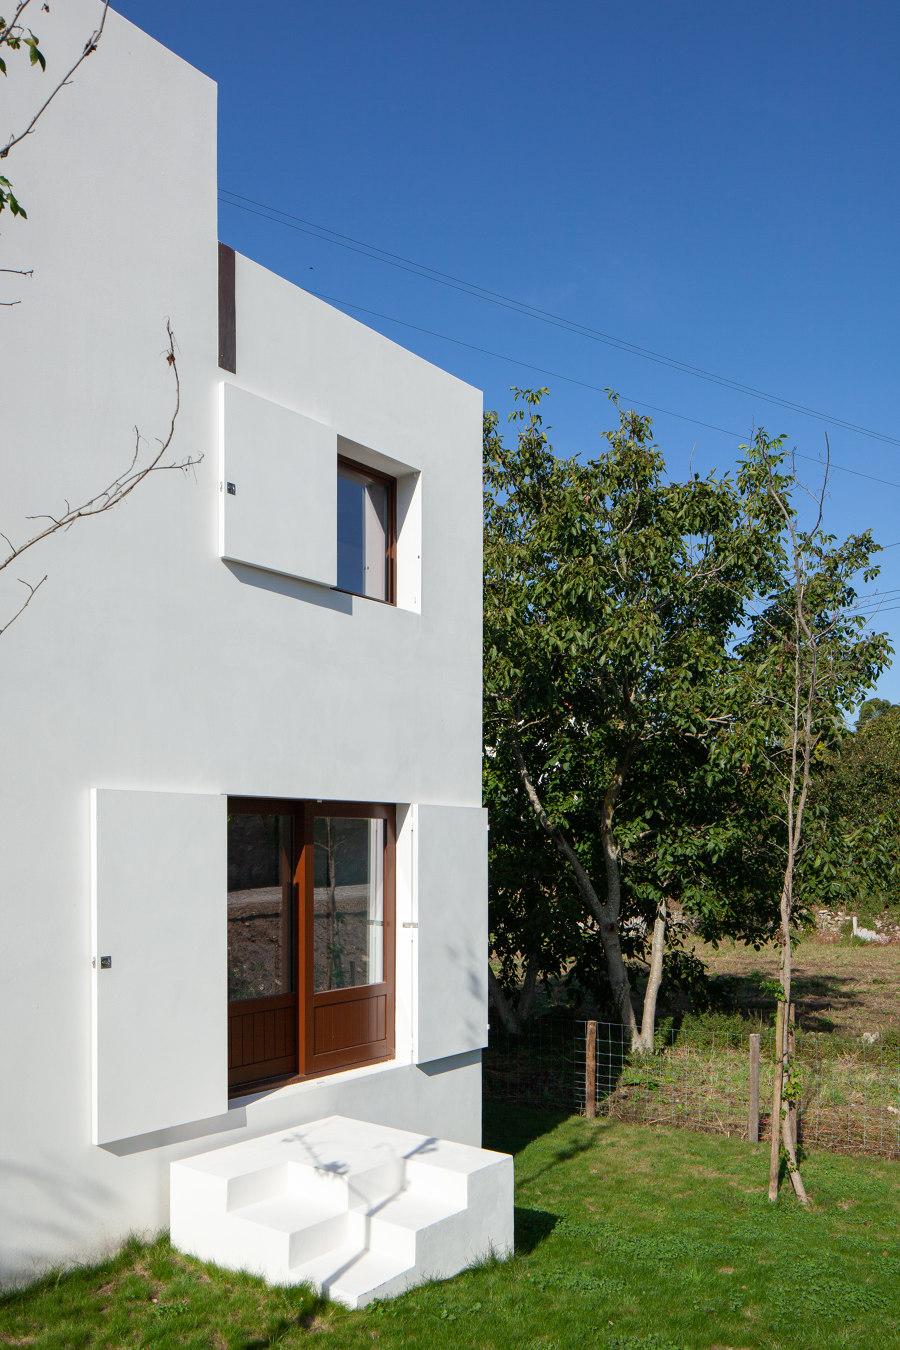 House in Afife by Guilherme Machado Vaz | Detached houses